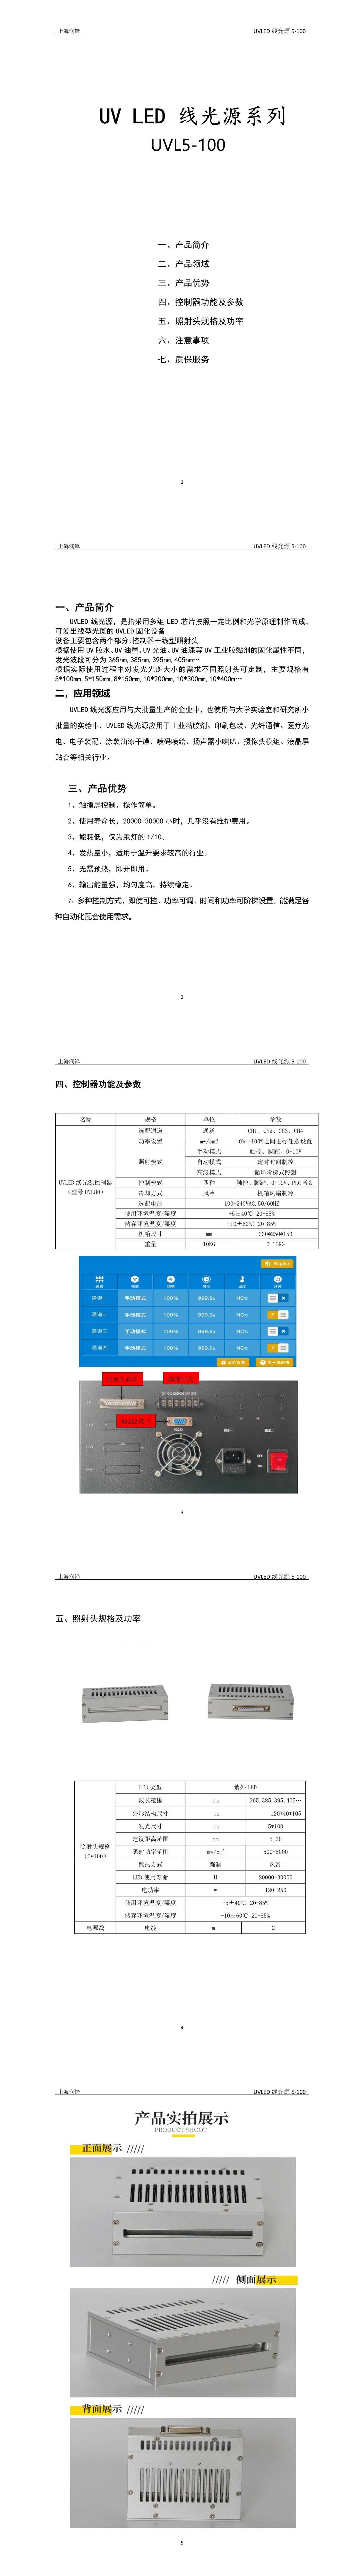 UVLED线光源UVL5-100